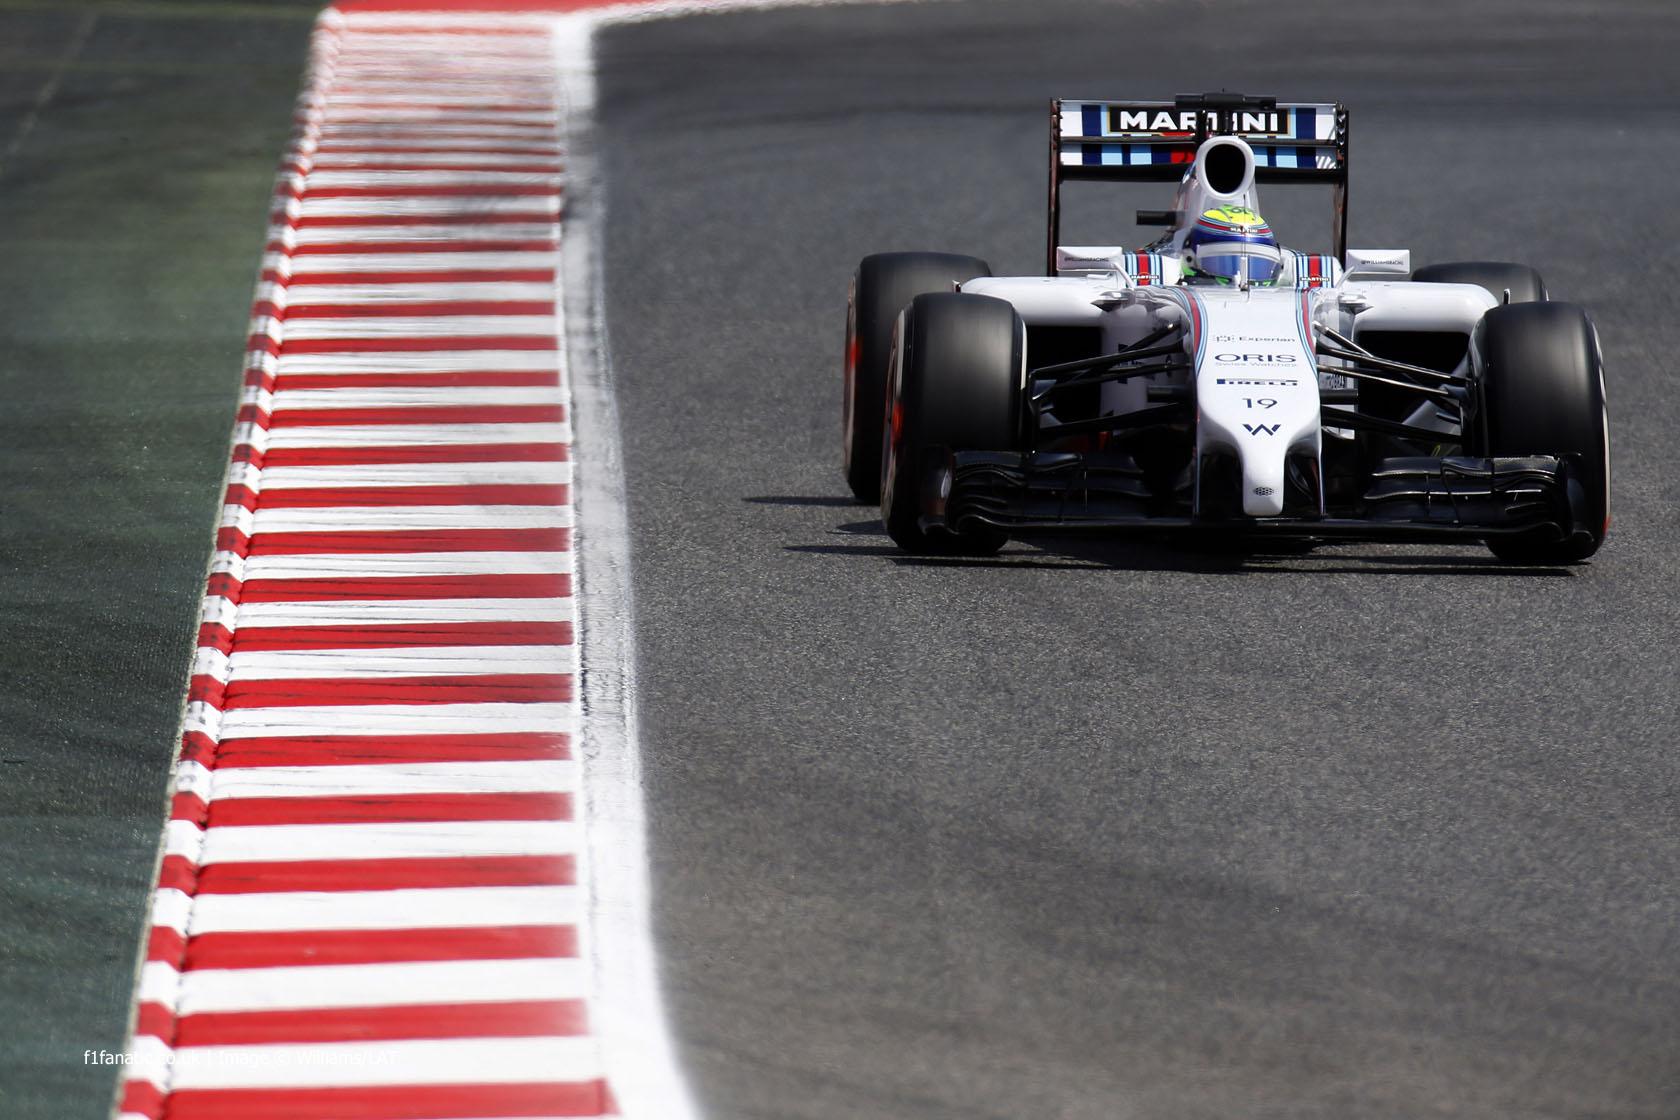 Felipe Massa, Williams, Circuit de Catalunya, 2014